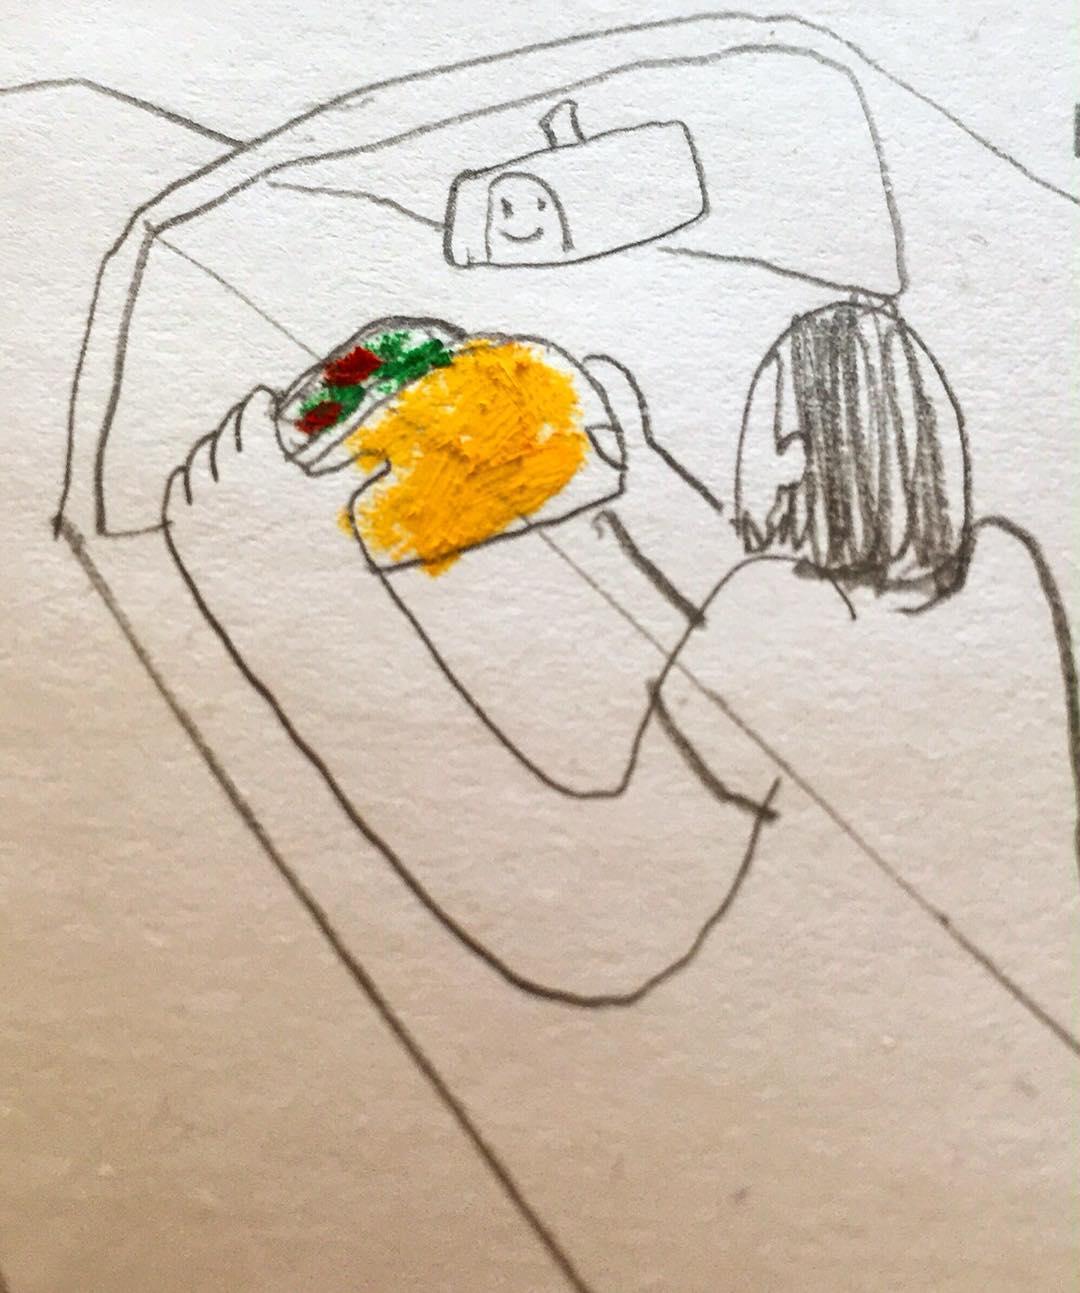 Drawn taco @munkochoe hardshell steering wheel taco